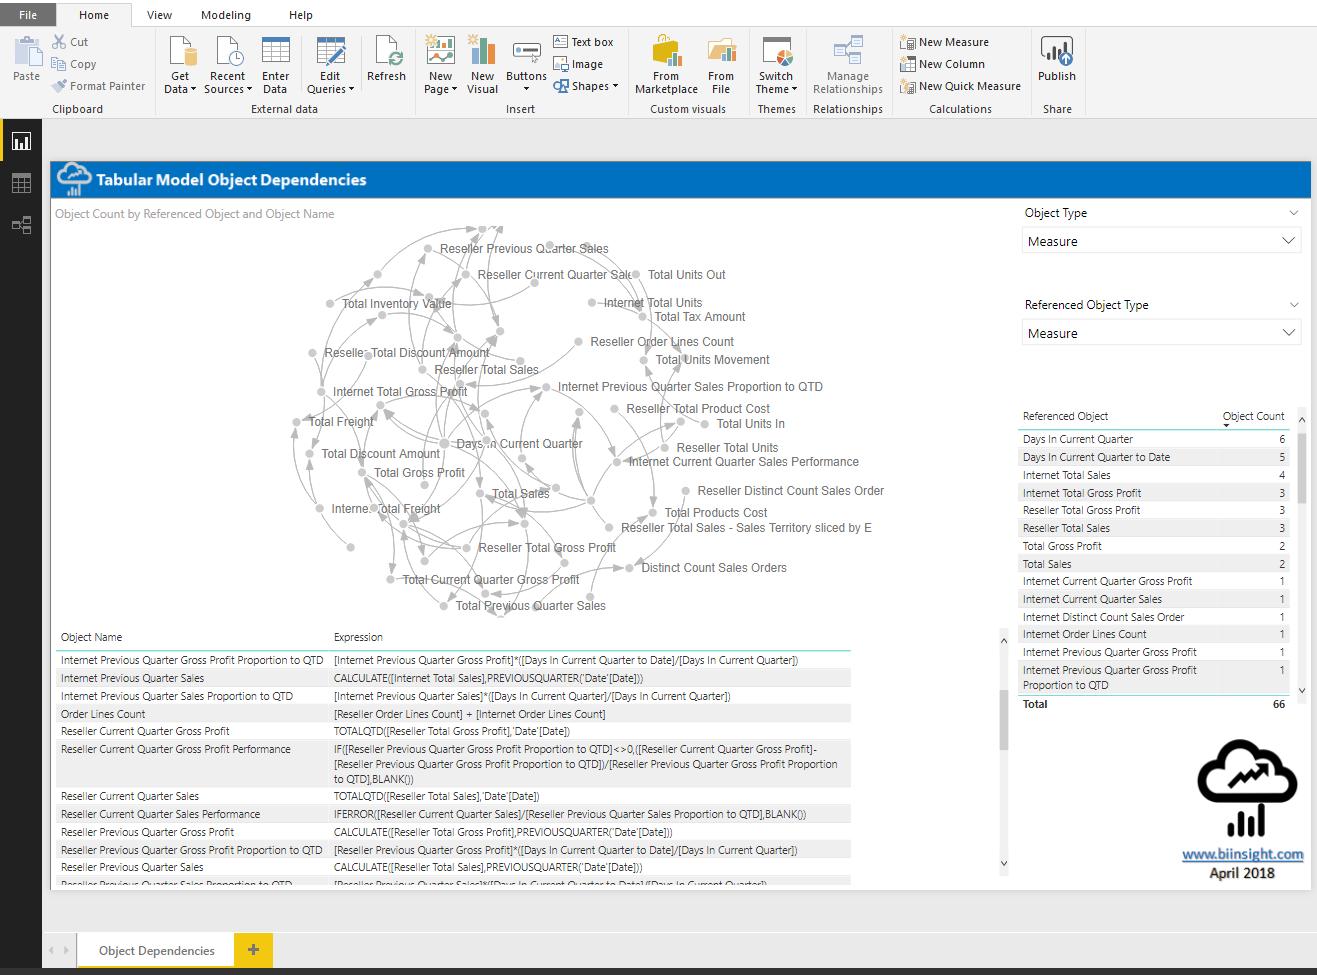 DAX Measure Dependencies in SSAS Tabular and Power BI